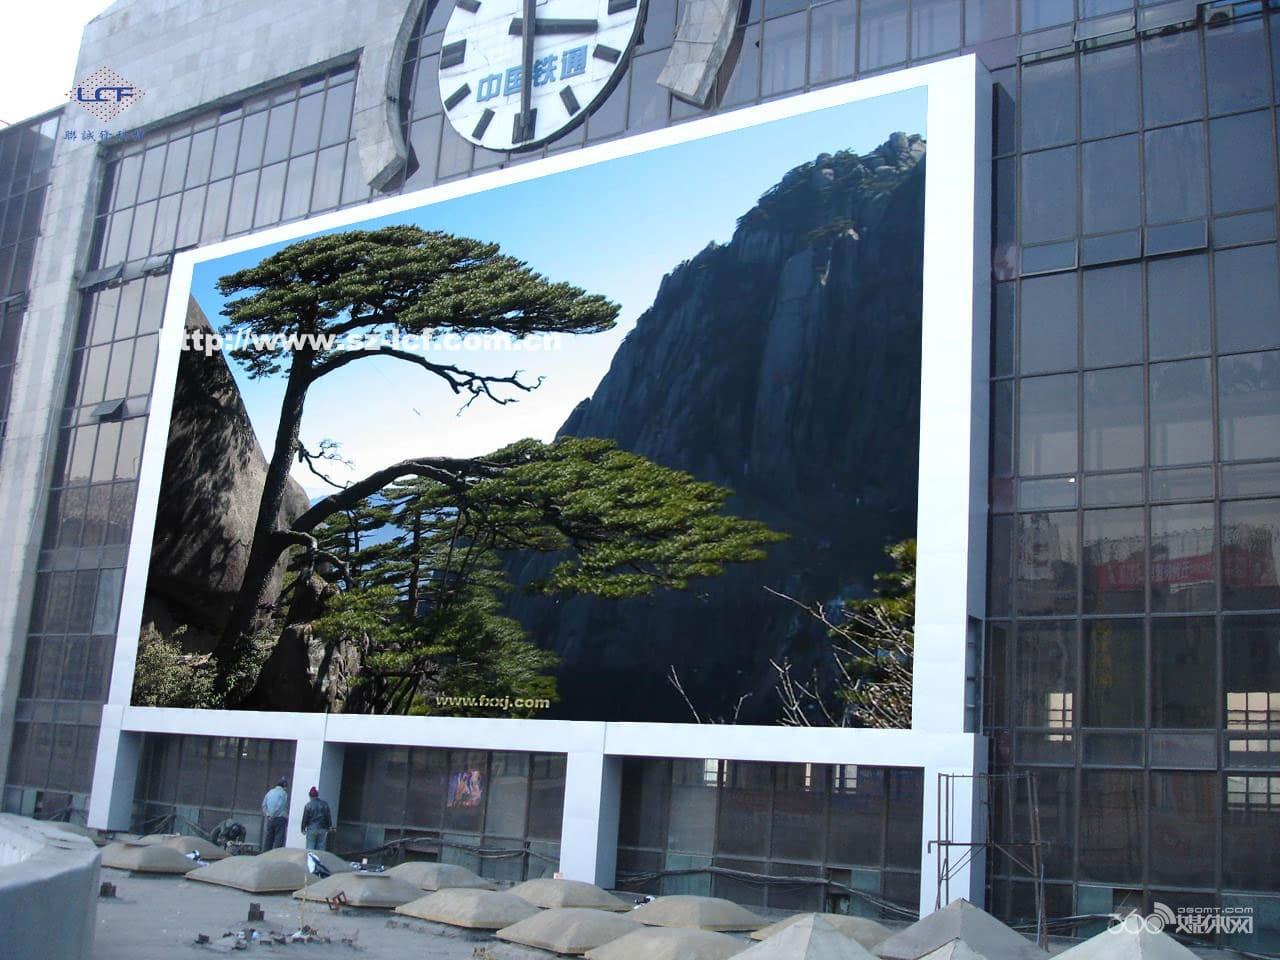 B2b portal tradekorea no 1 b2b marketplace for korea for Exterior led screen